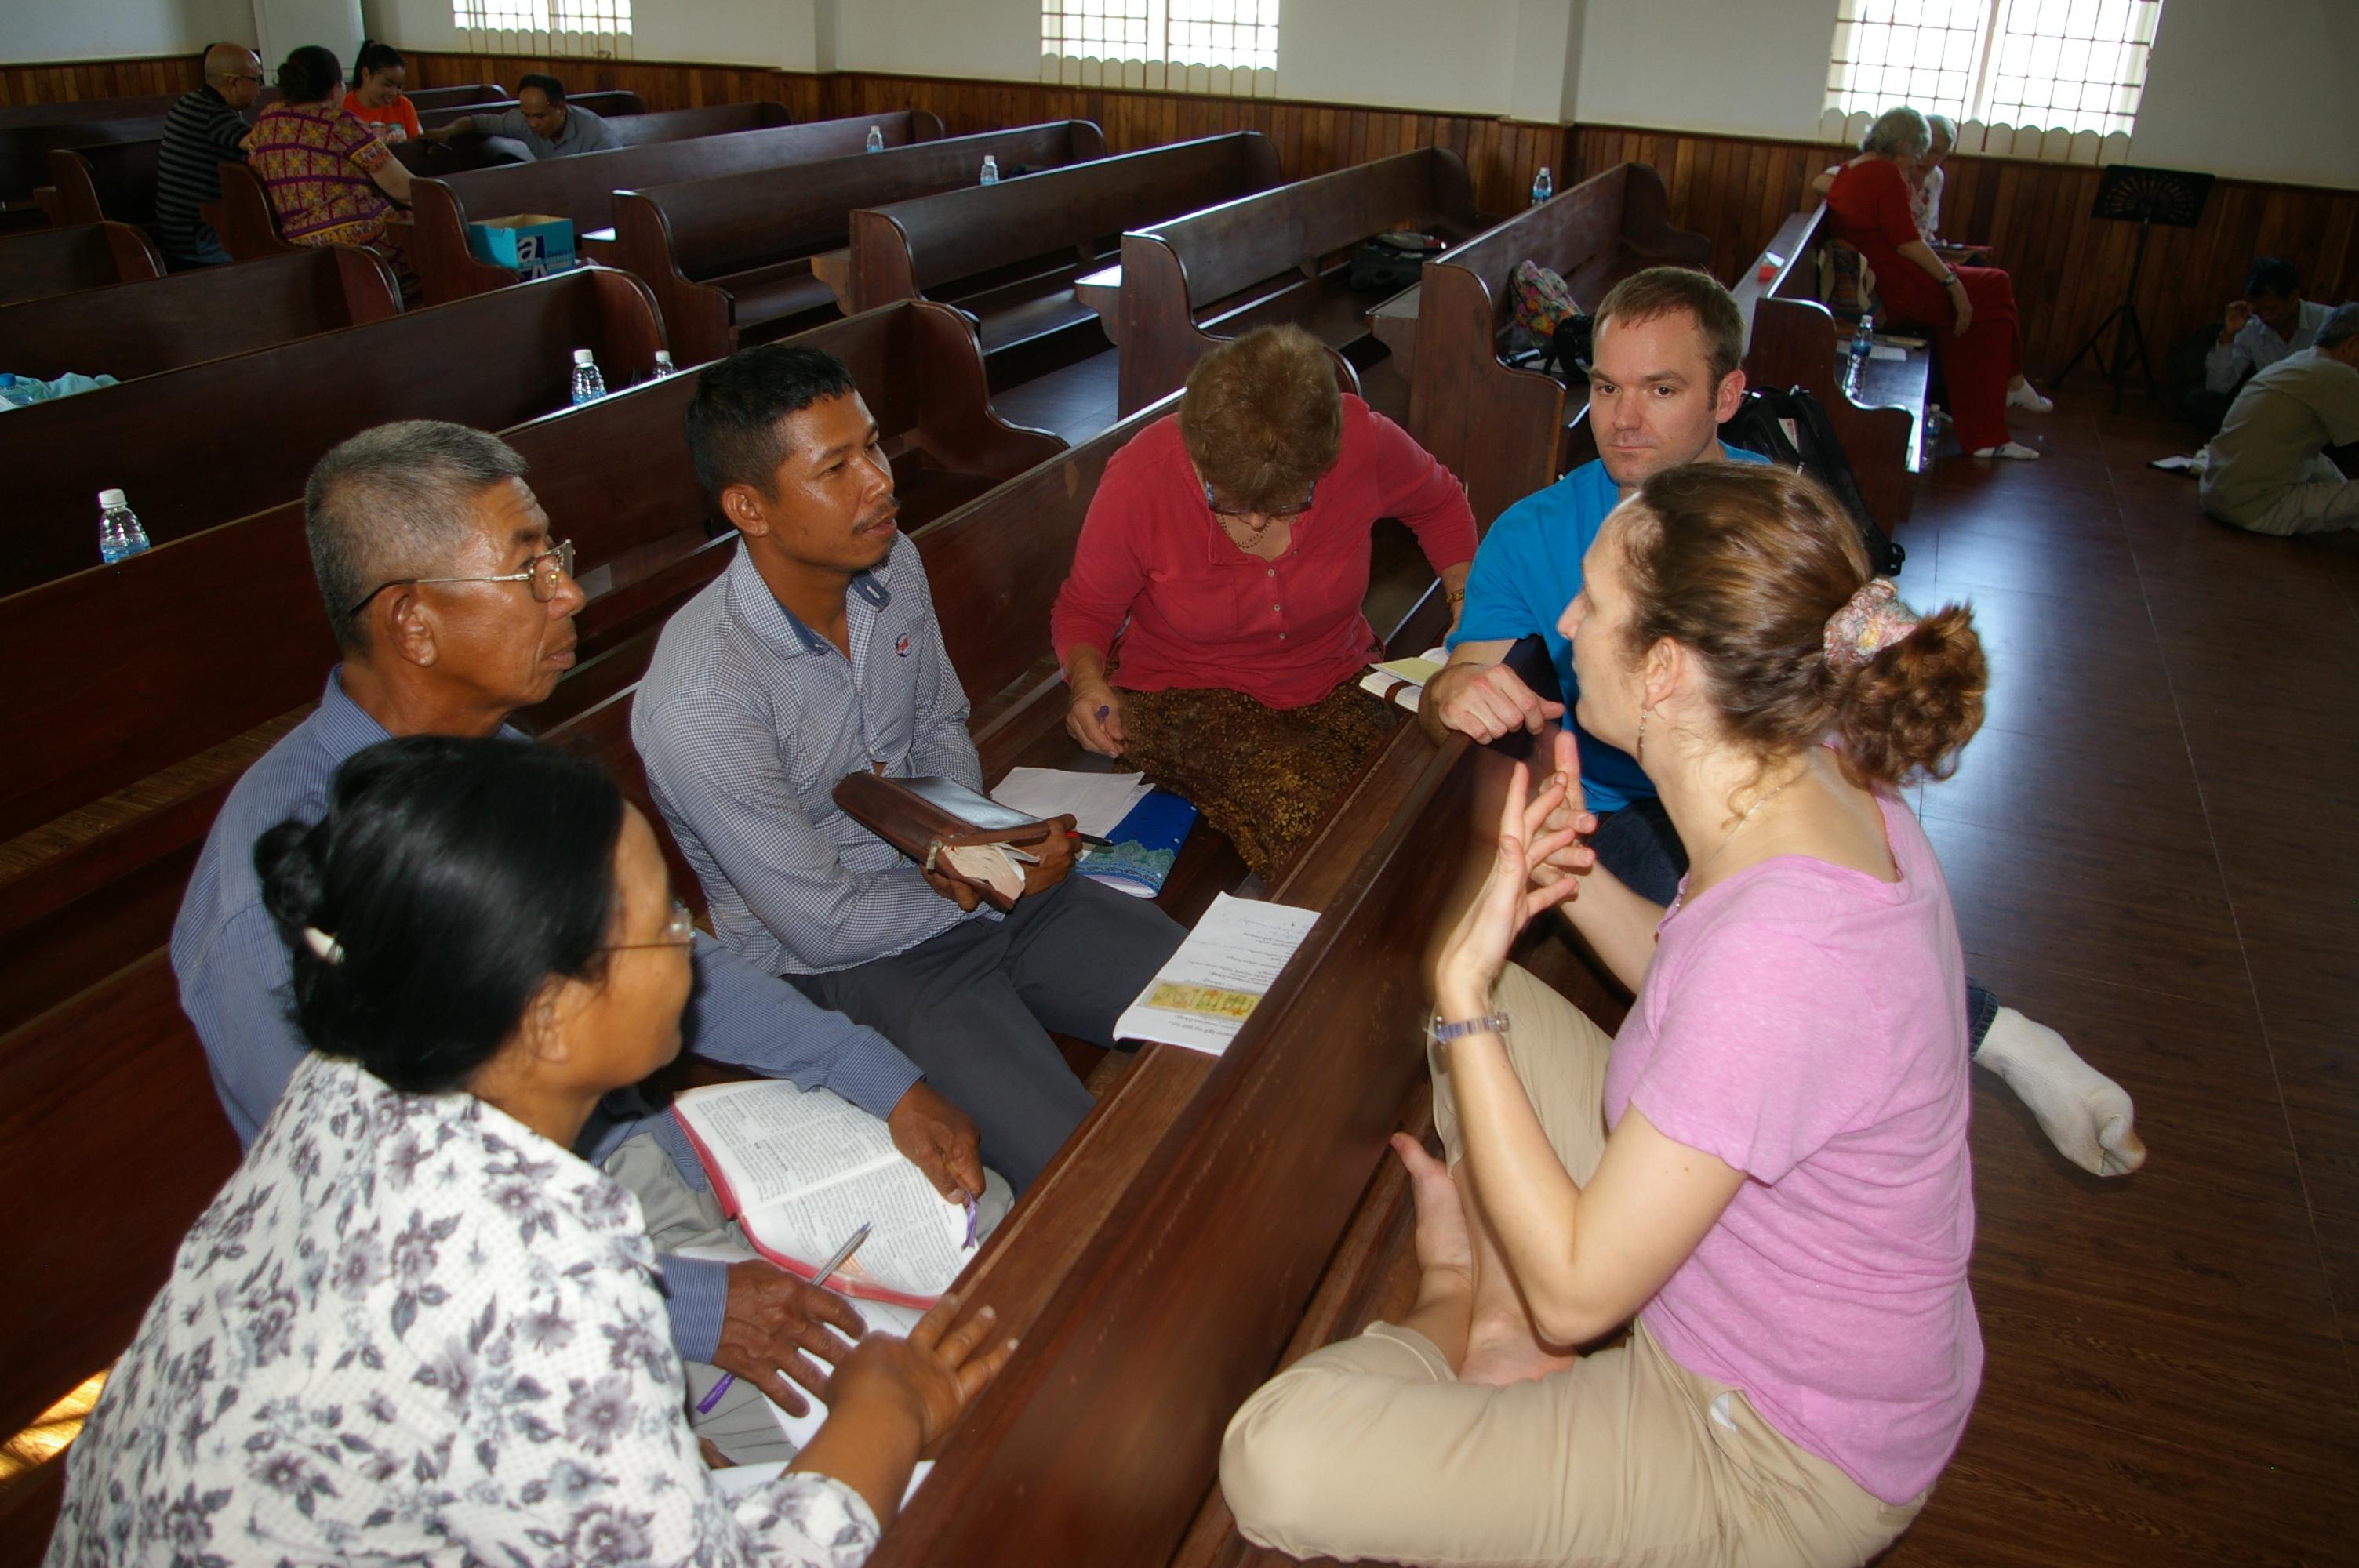 2017 Cambodia Bible Study